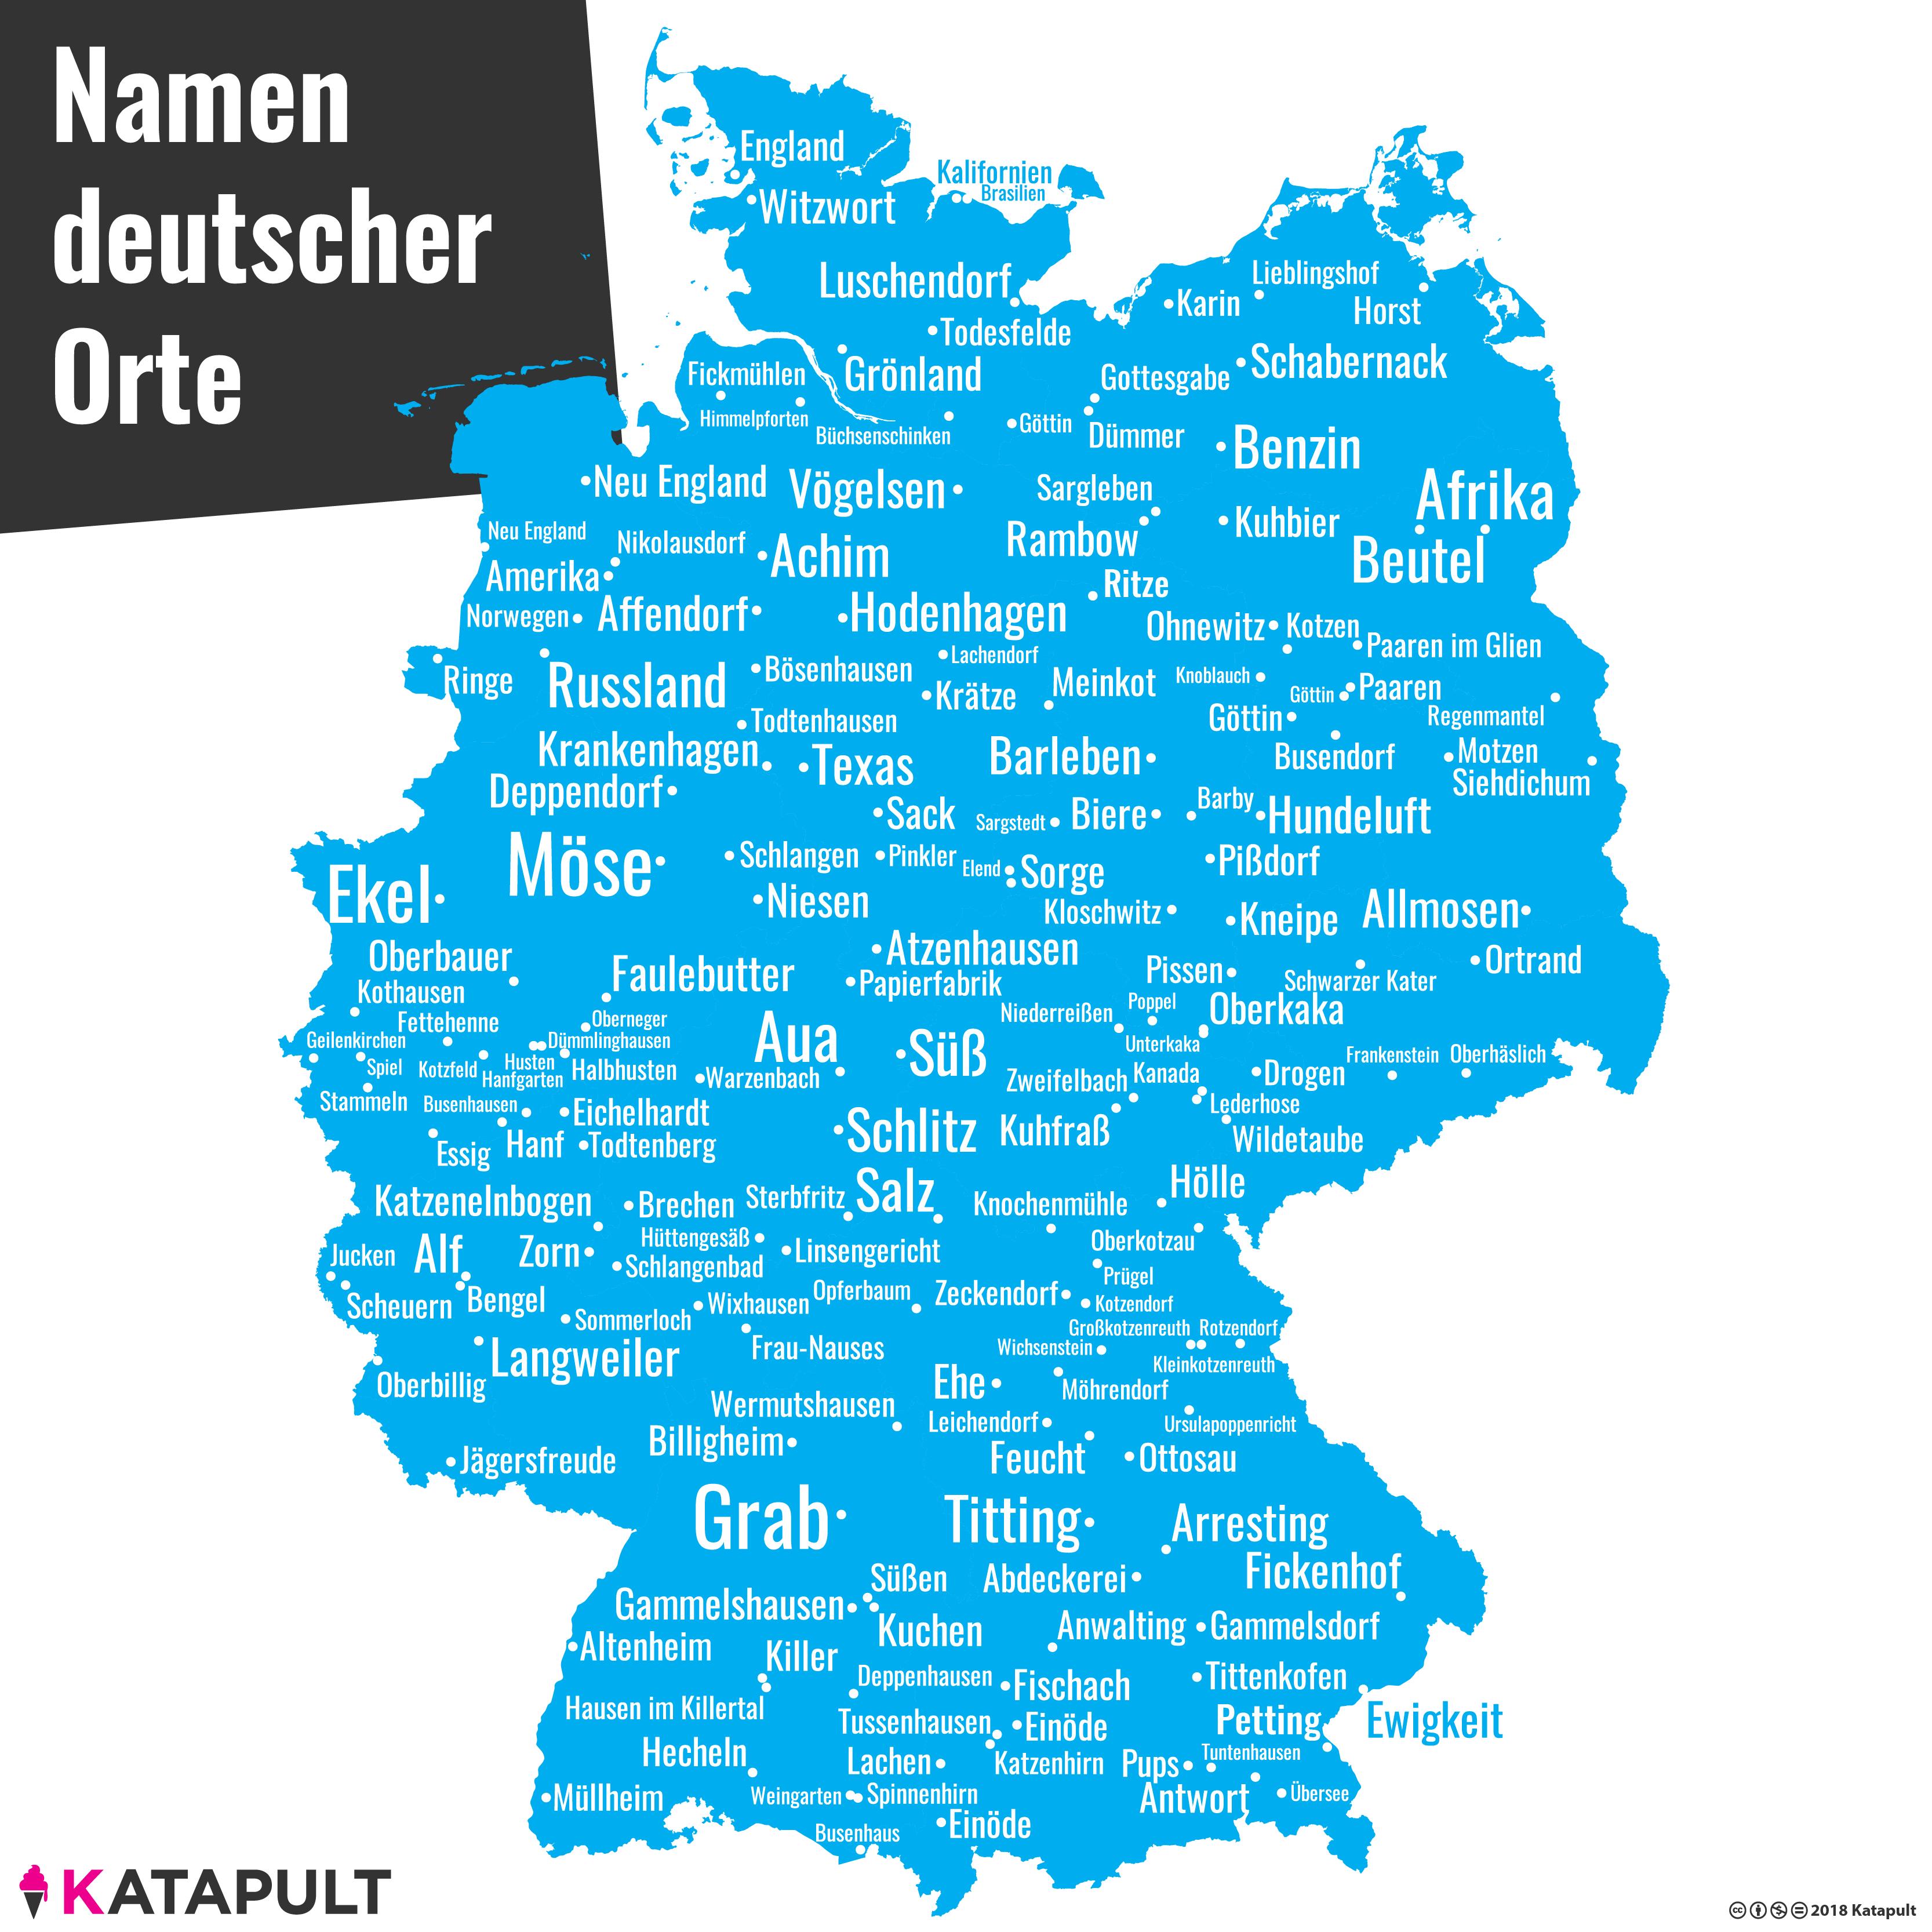 namen deutschland karte Deutschlandkarte   Namen deutscher Orte